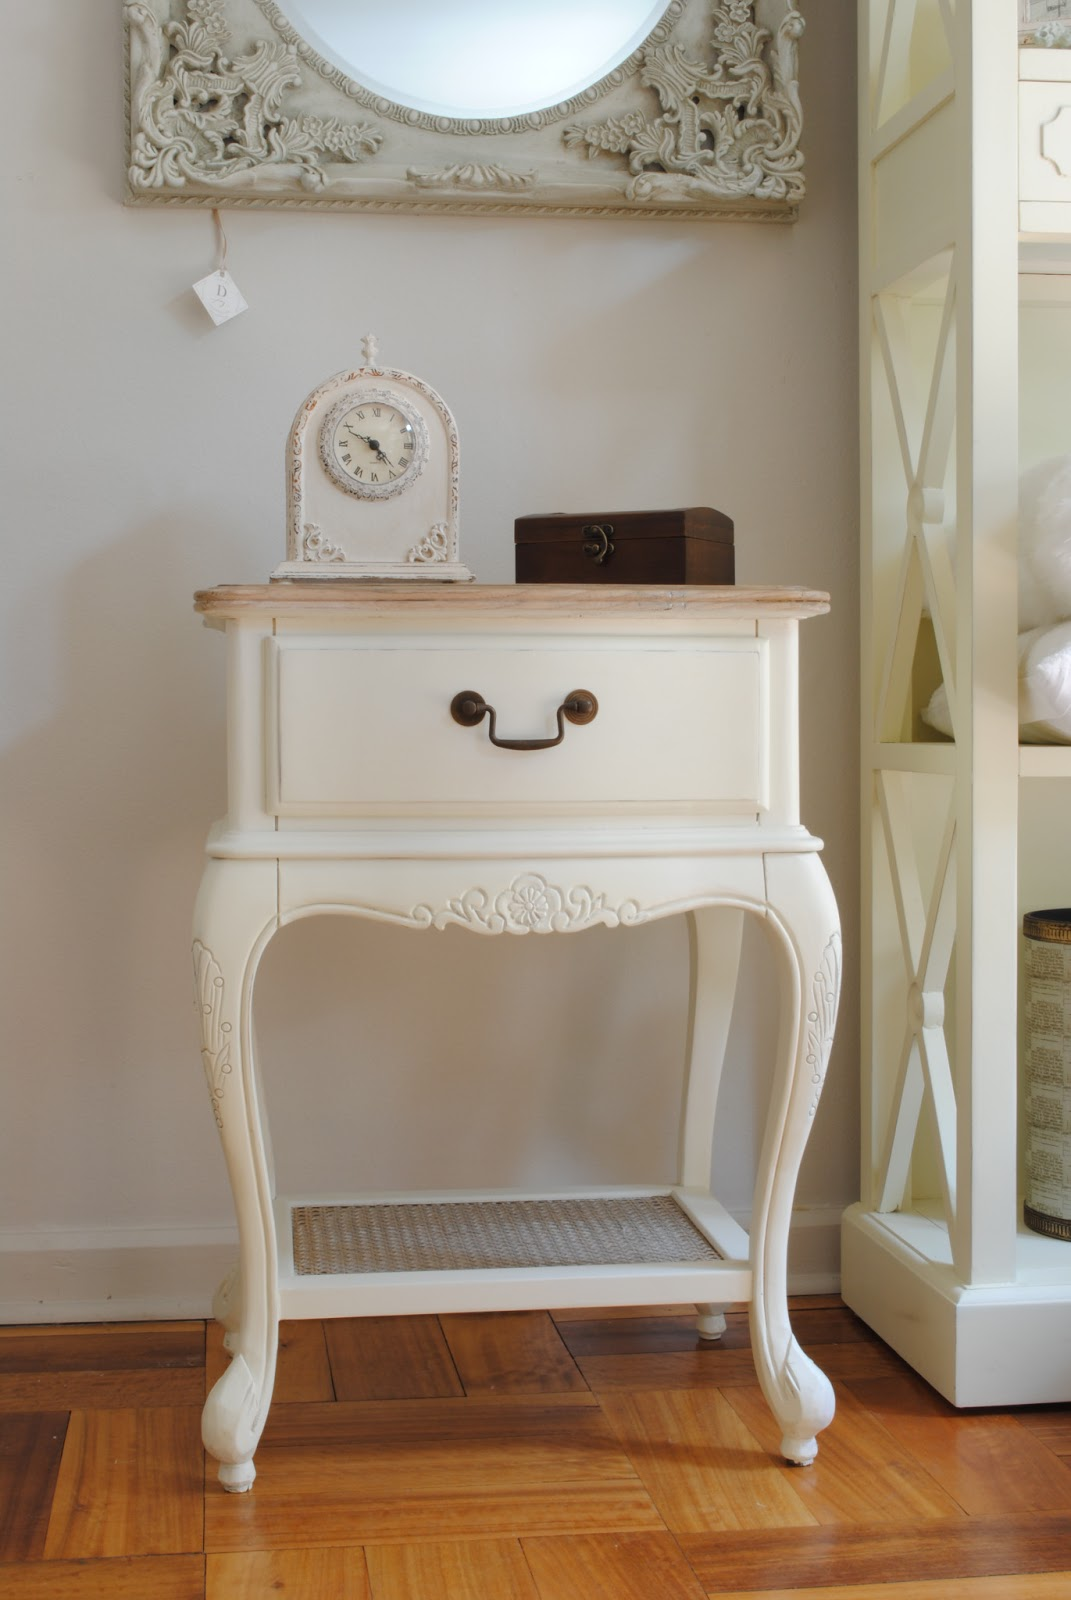 Paz montealegre decoraci n muebles provenzal blancos - Estilo provenzal muebles ...